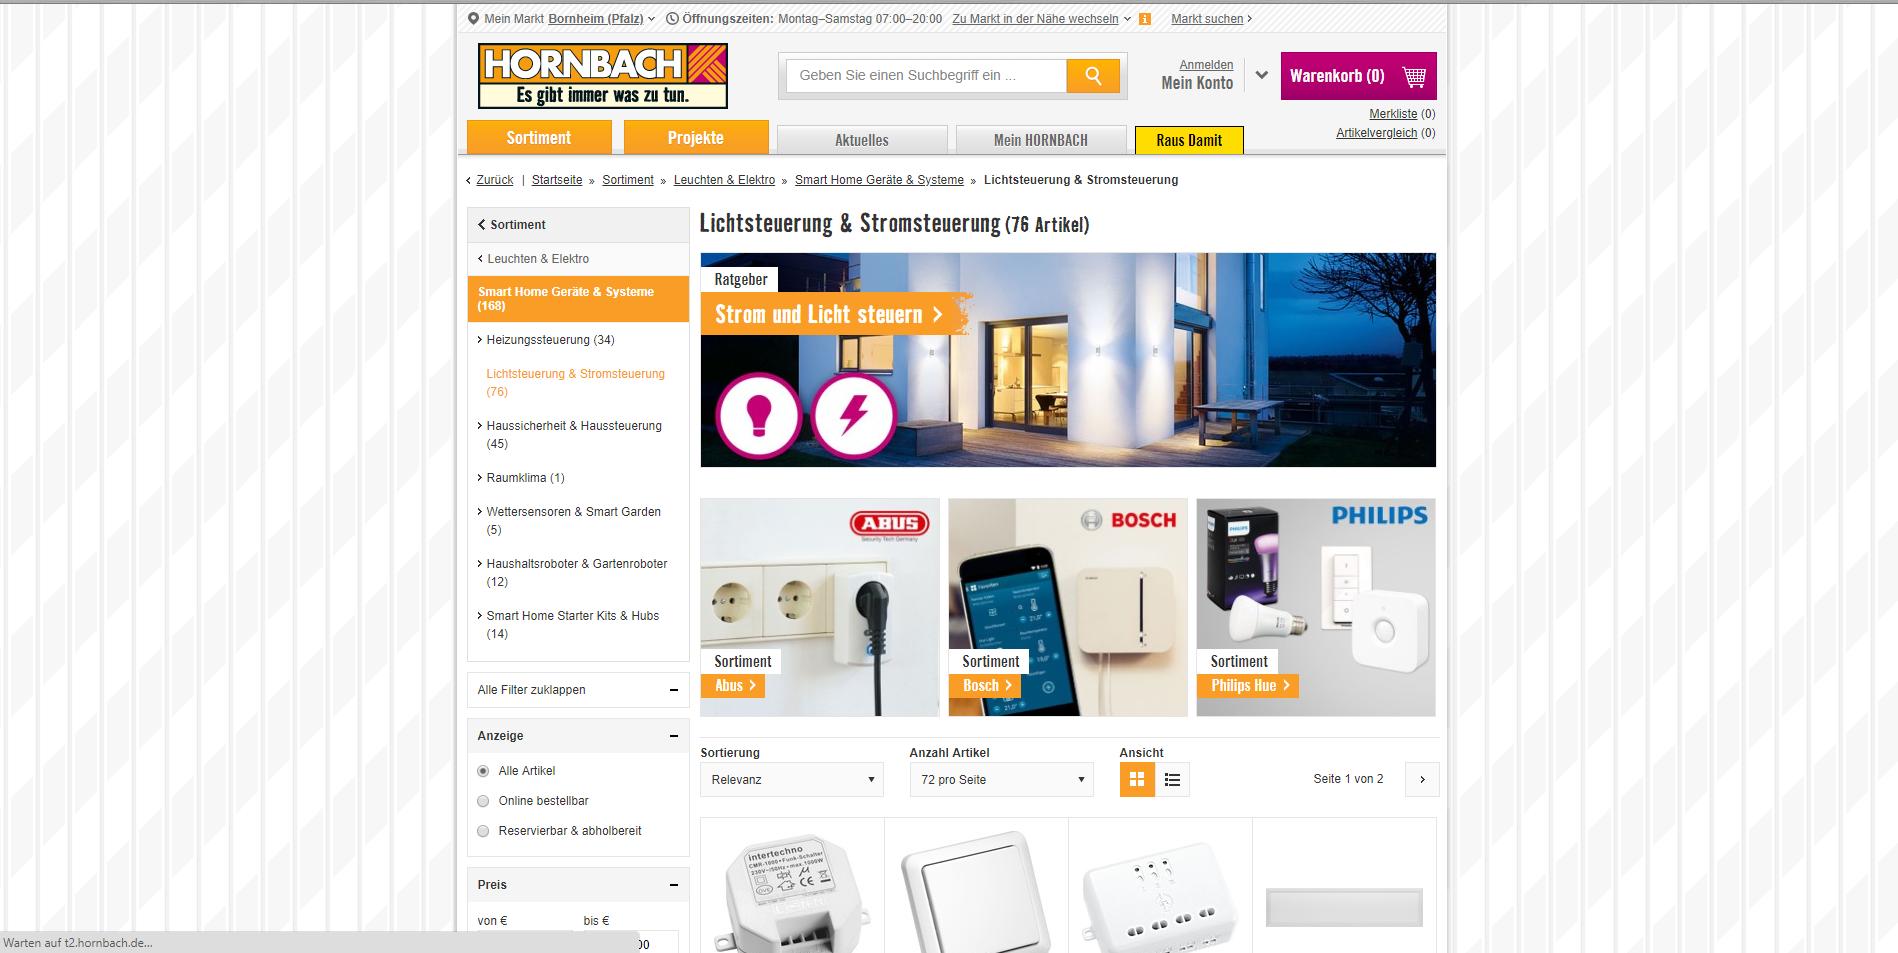 hornbach smart home anbieter licht und stromsteuerung screenshot 3 azu. Black Bedroom Furniture Sets. Home Design Ideas